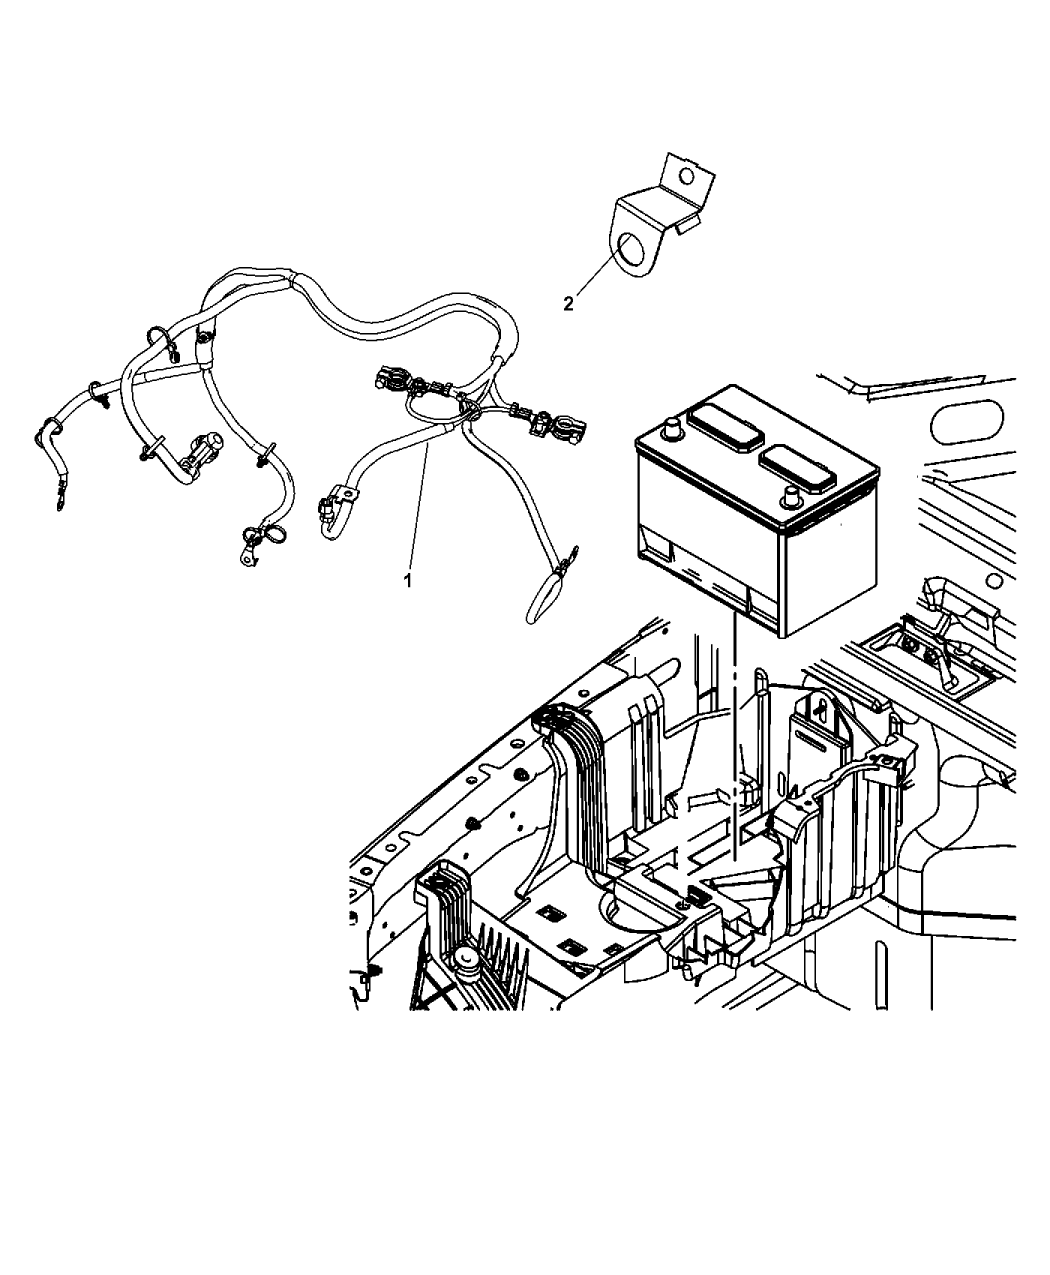 2009 Jeep Wrangler Unlimited Radio Wiring Diagram: Genuine Jeep WIRING-BATTERY